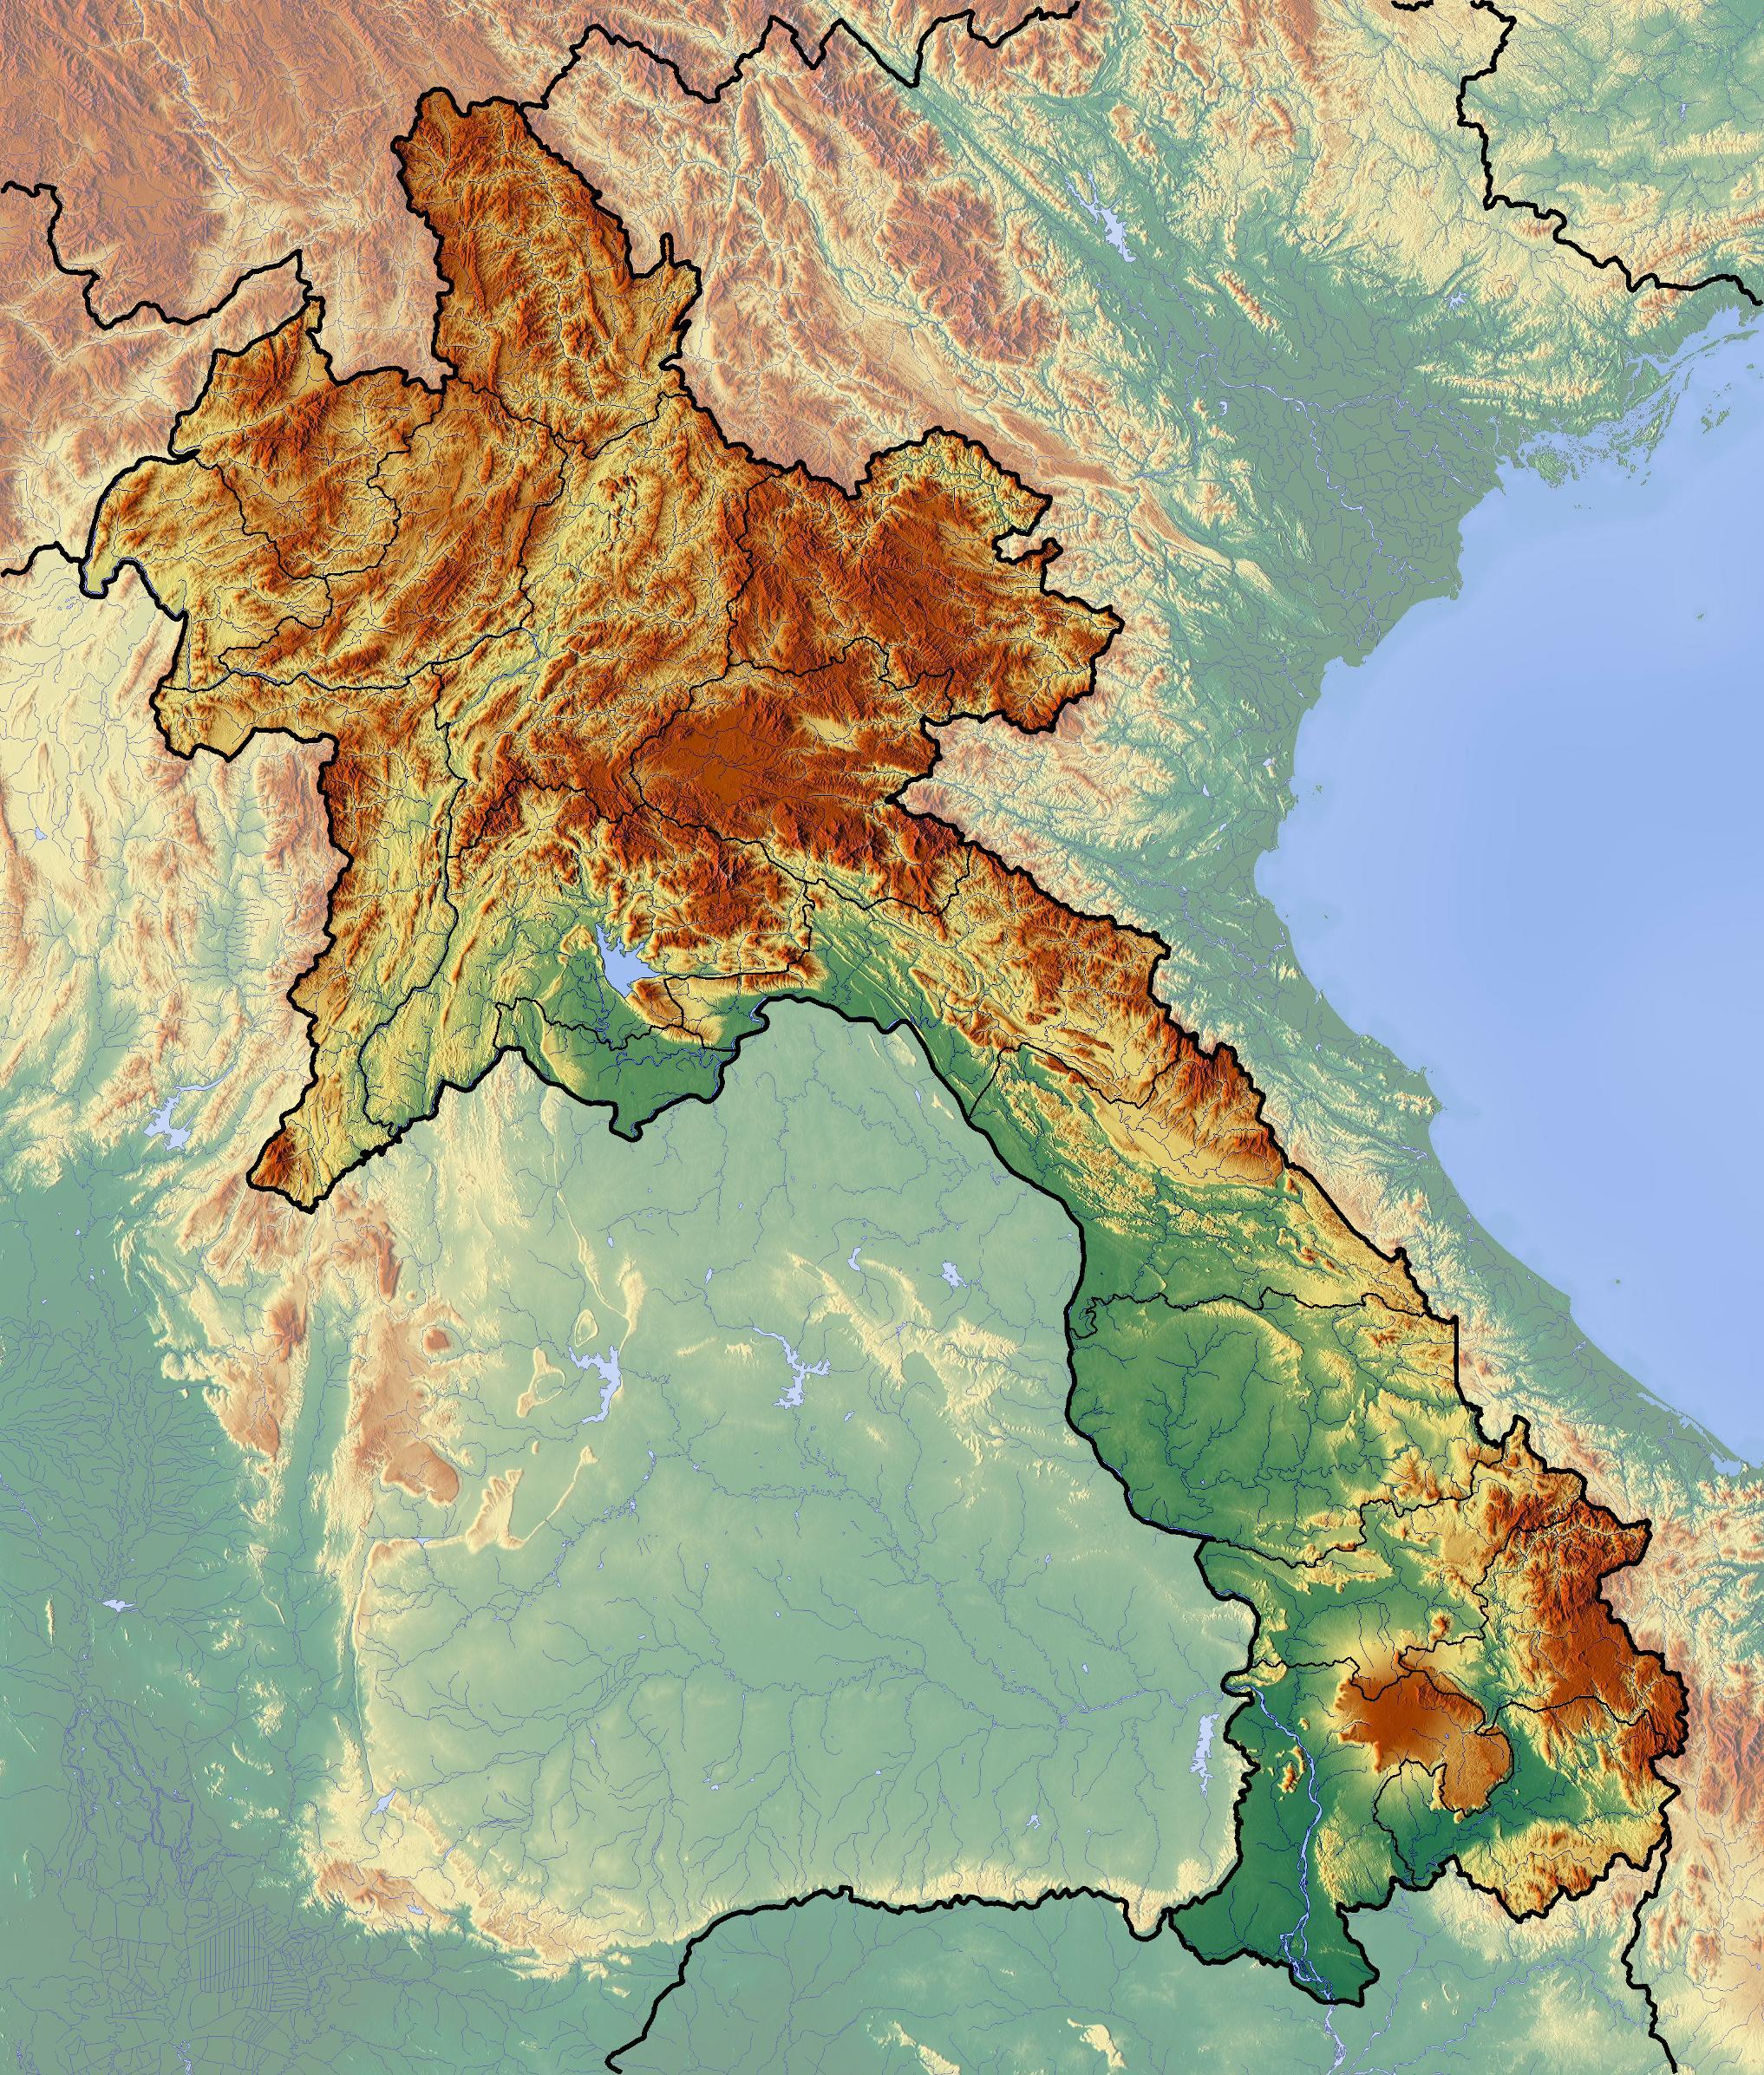 Laos Topografisk Kort Kort Over Laos Topografisk Syd Ostlige